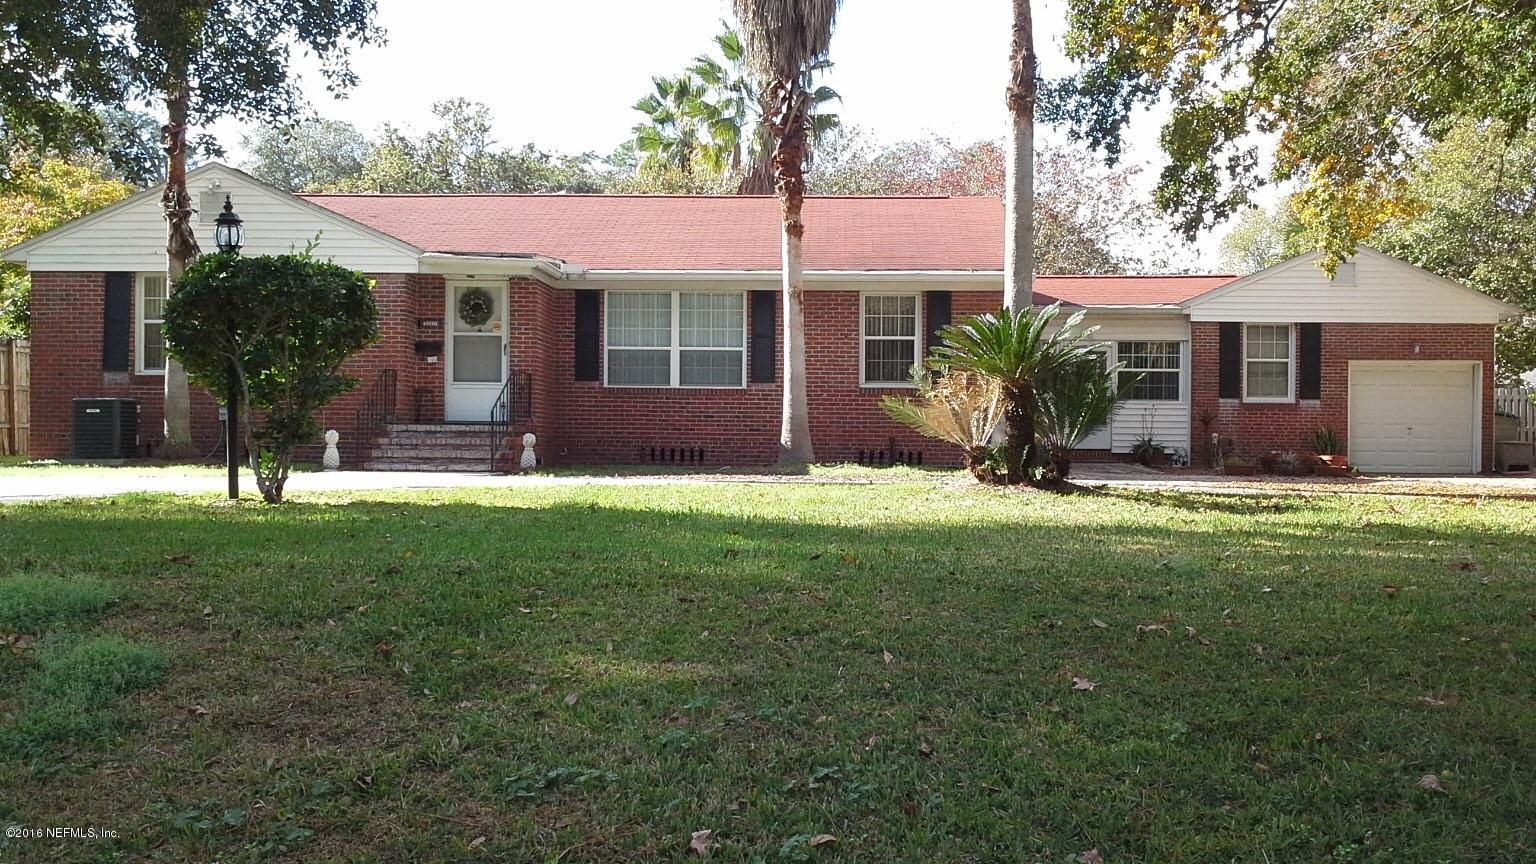 4936 ORTEGA, JACKSONVILLE, FLORIDA 32210, 3 Bedrooms Bedrooms, ,2 BathroomsBathrooms,Residential - single family,For sale,ORTEGA,856668